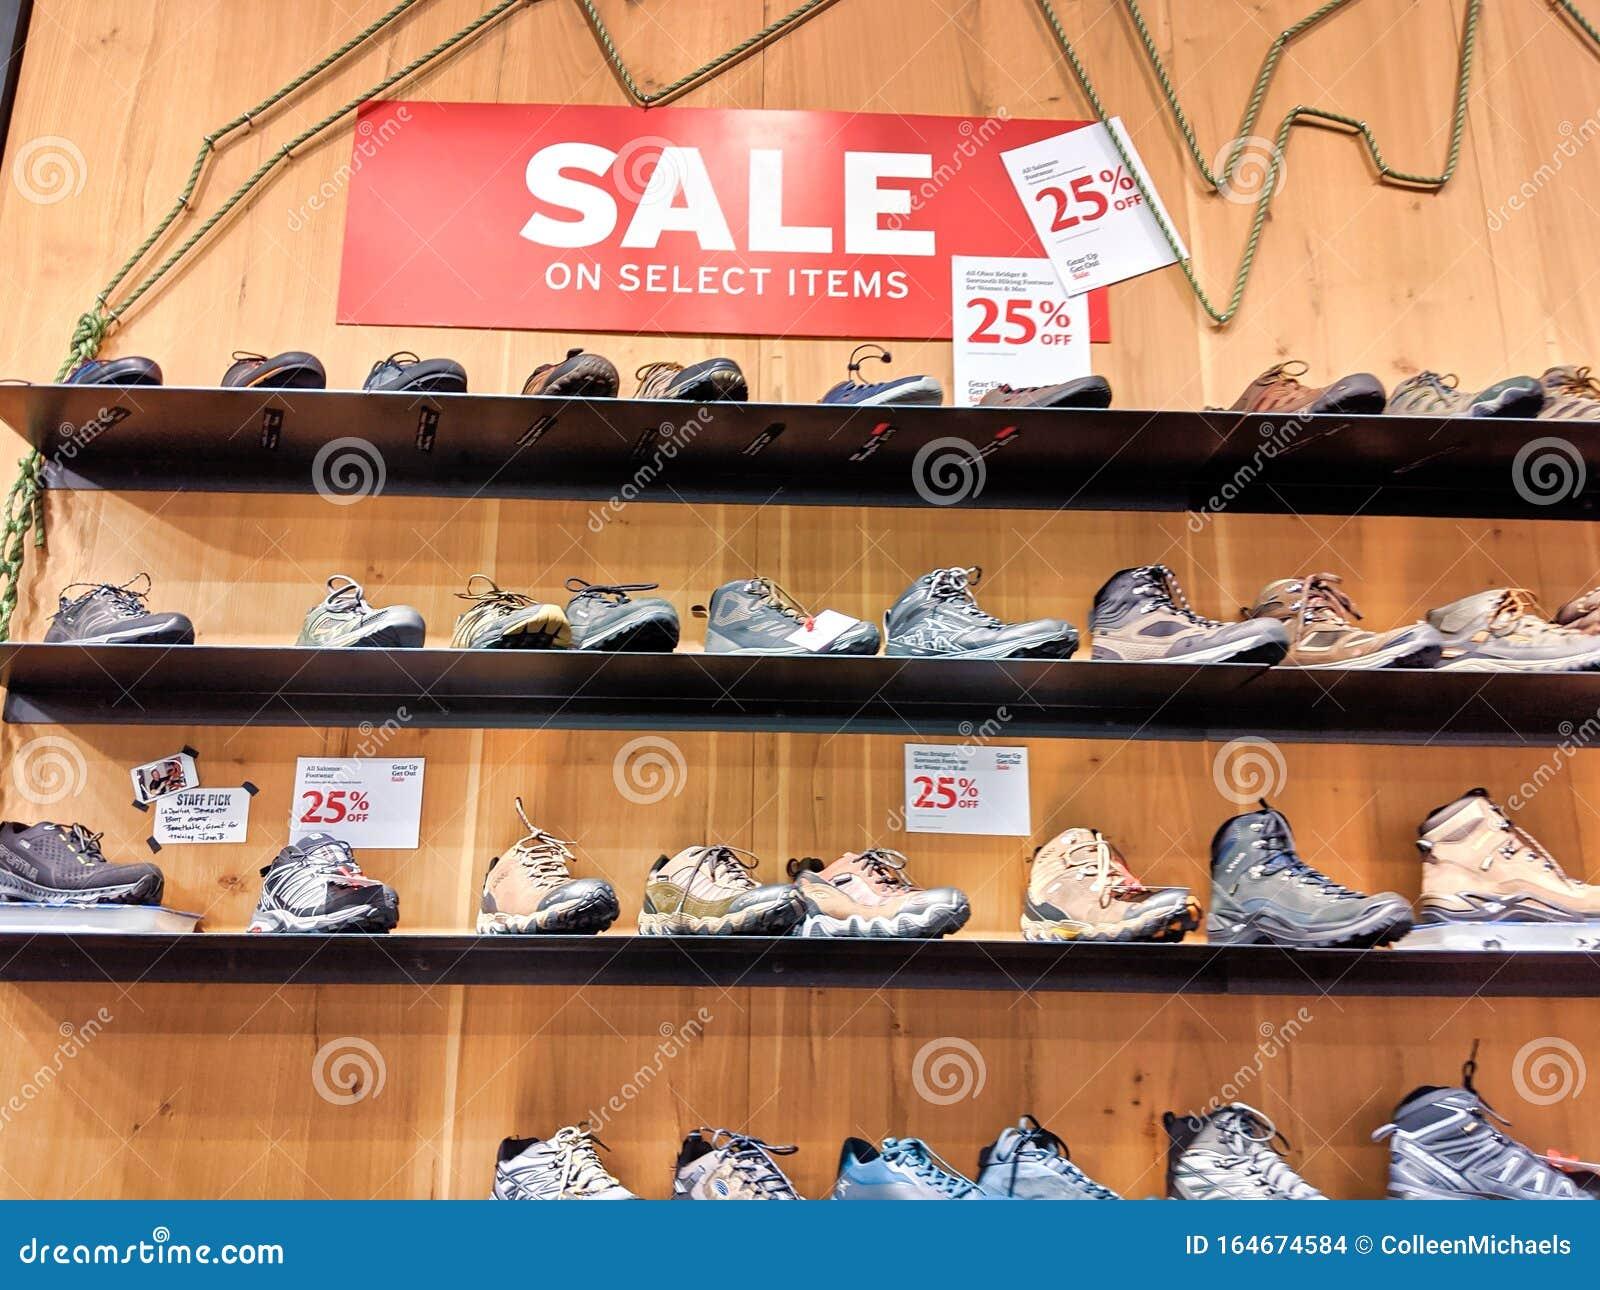 rei hiking shoes sale